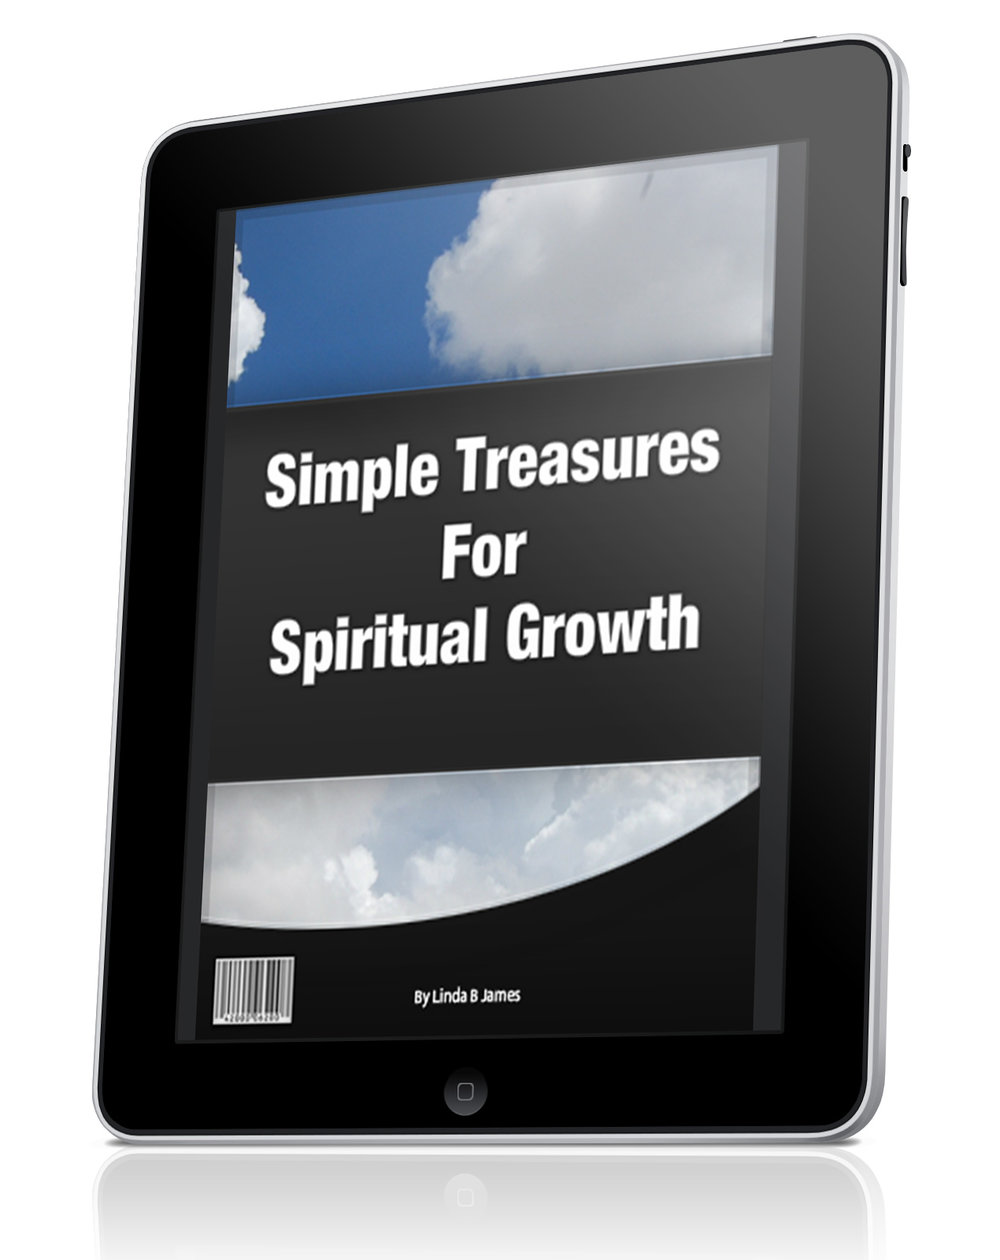 ST Spiritual Growth-ebook.jpg